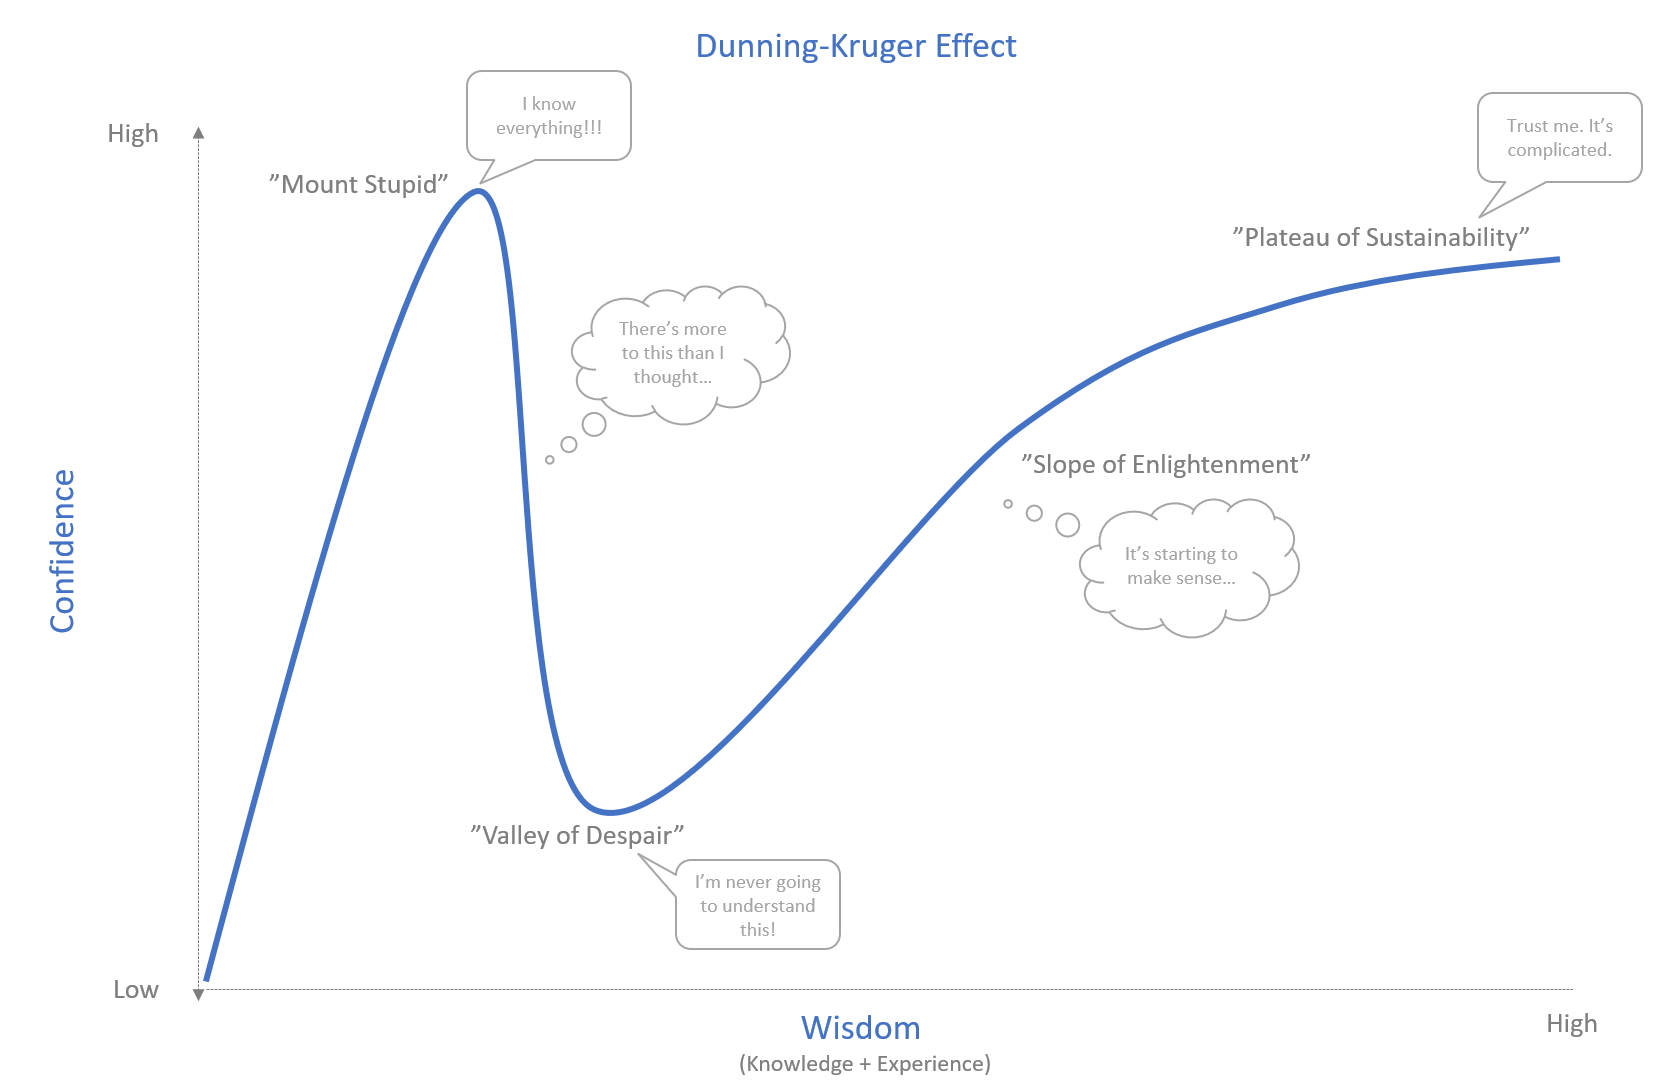 Sa ne amintim efectul Dunning-Kruger - III